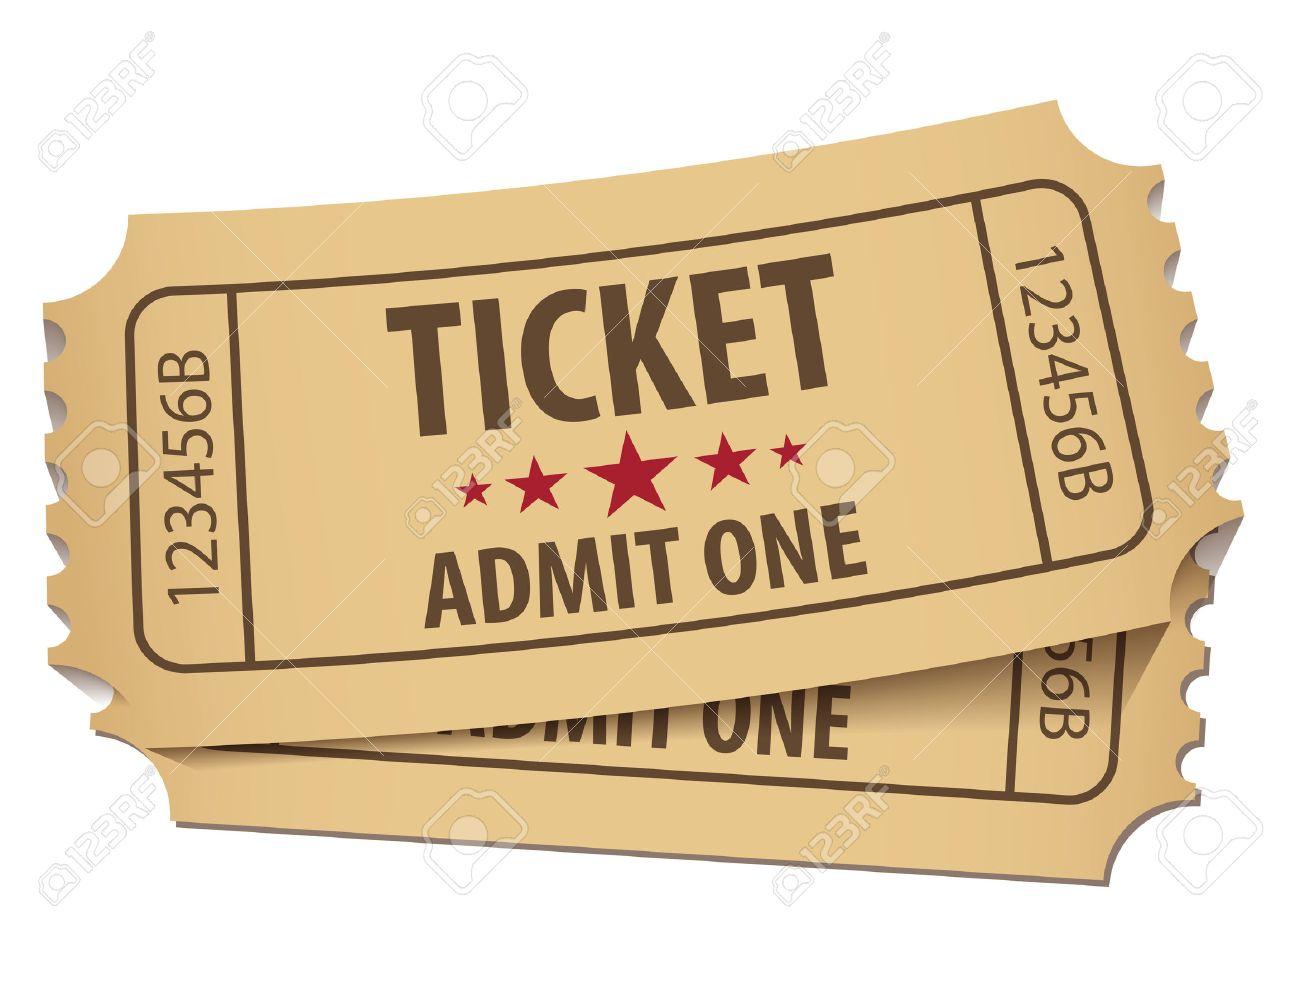 Cinema ticket. Vector illustration. Conceptual illustration. Isolated on white background - 50125046